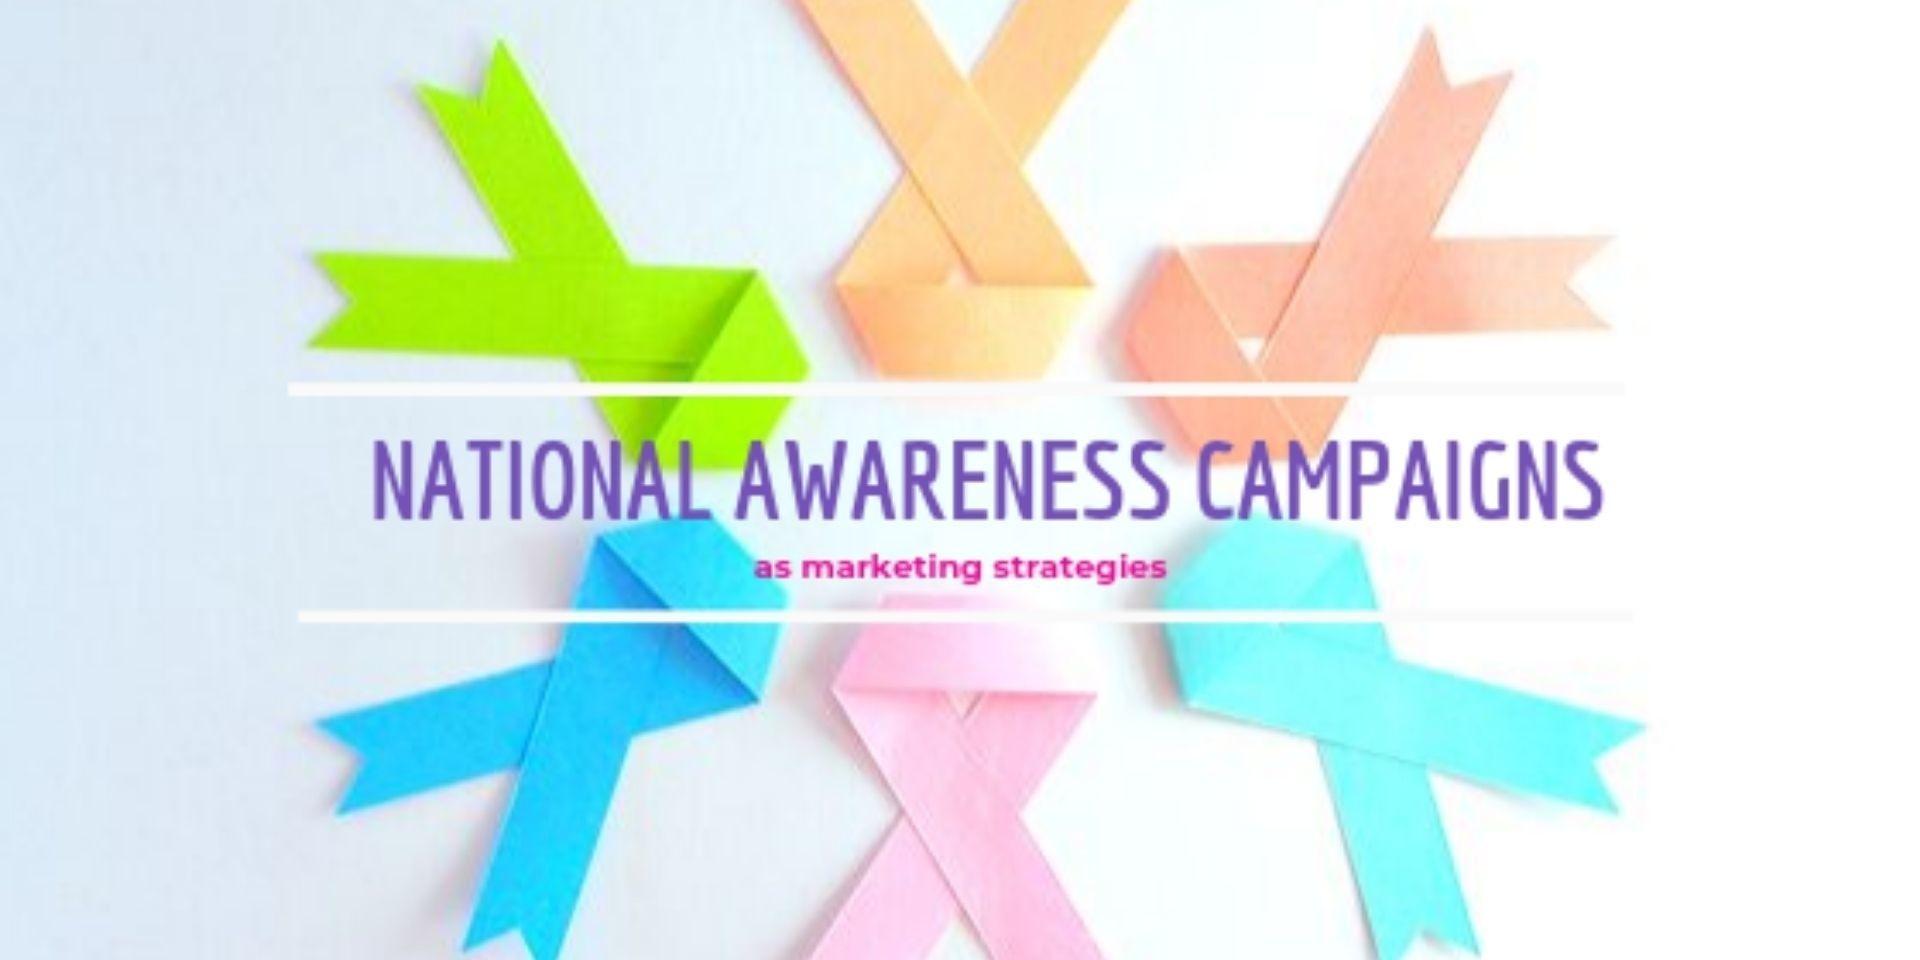 Health awareness campaign ideas